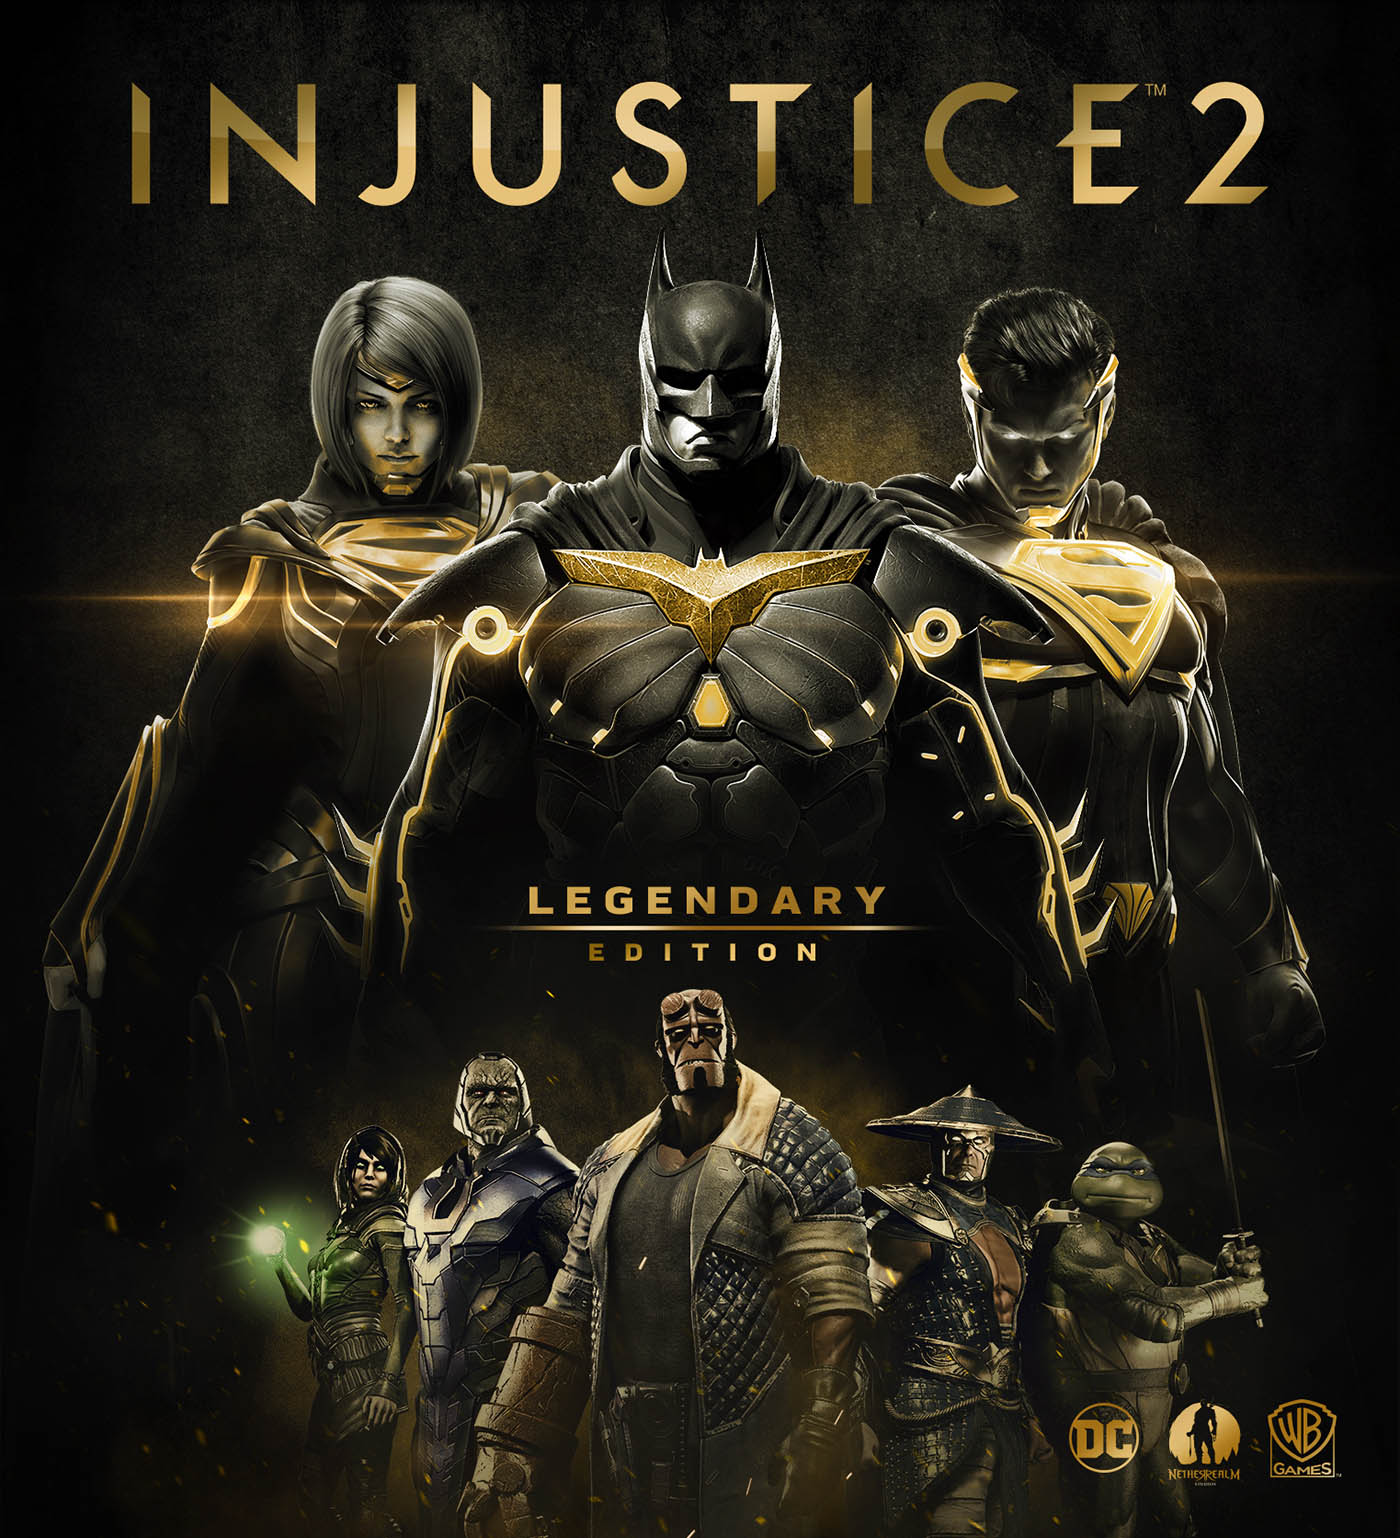 poster design ideas injustice2